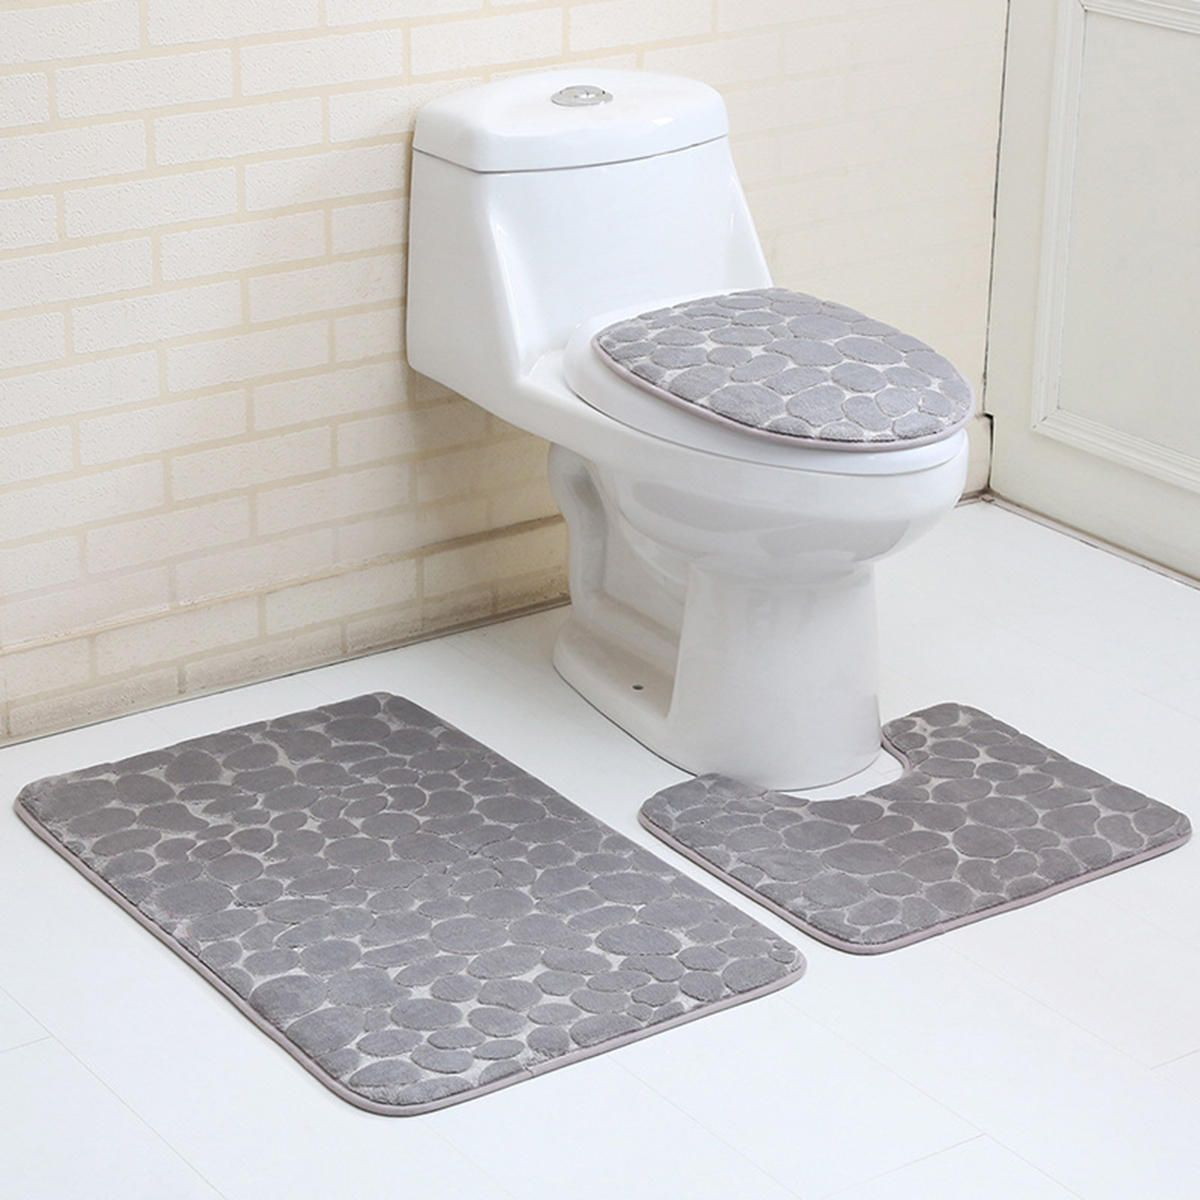 Us 17 10 3pcs Toilet Seat Covers Bathroom Carpet Non Slip